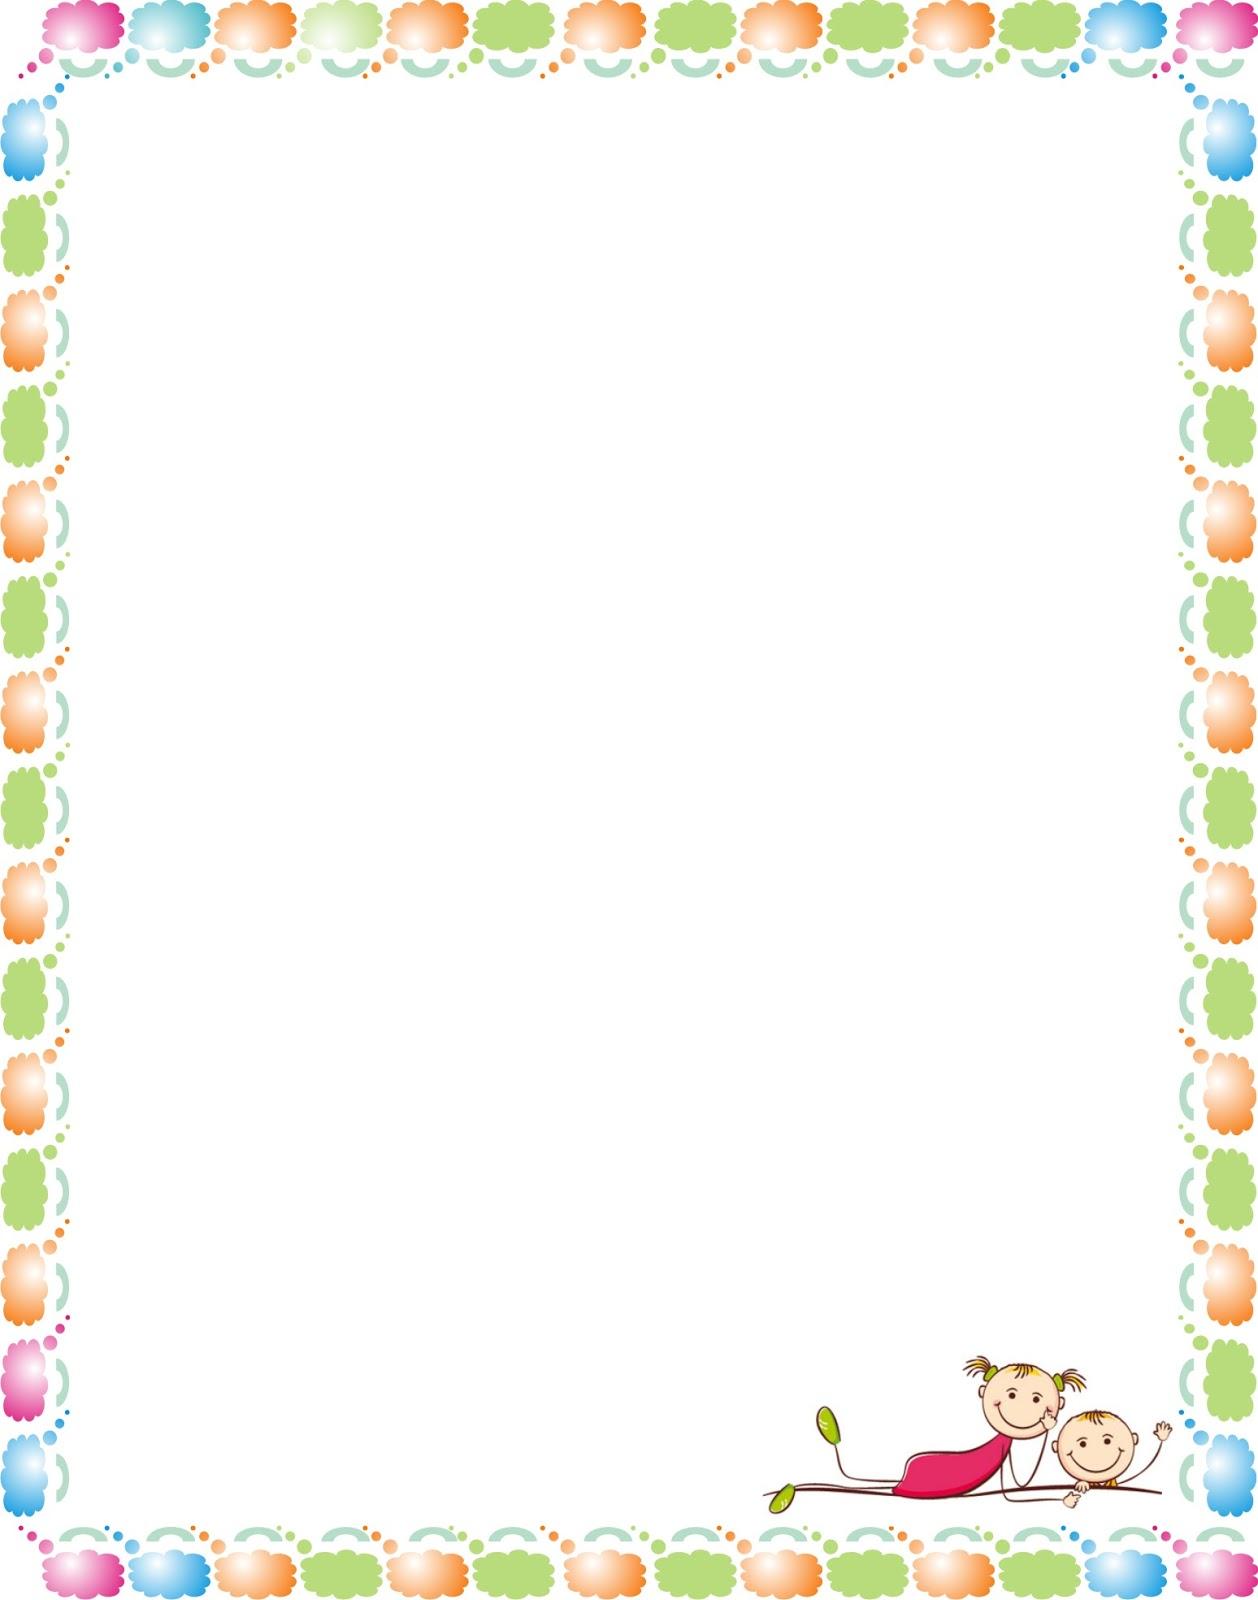 M s de 1000 im genes sobre bordes dibujos gafetes - Imagenes de nubes infantiles ...